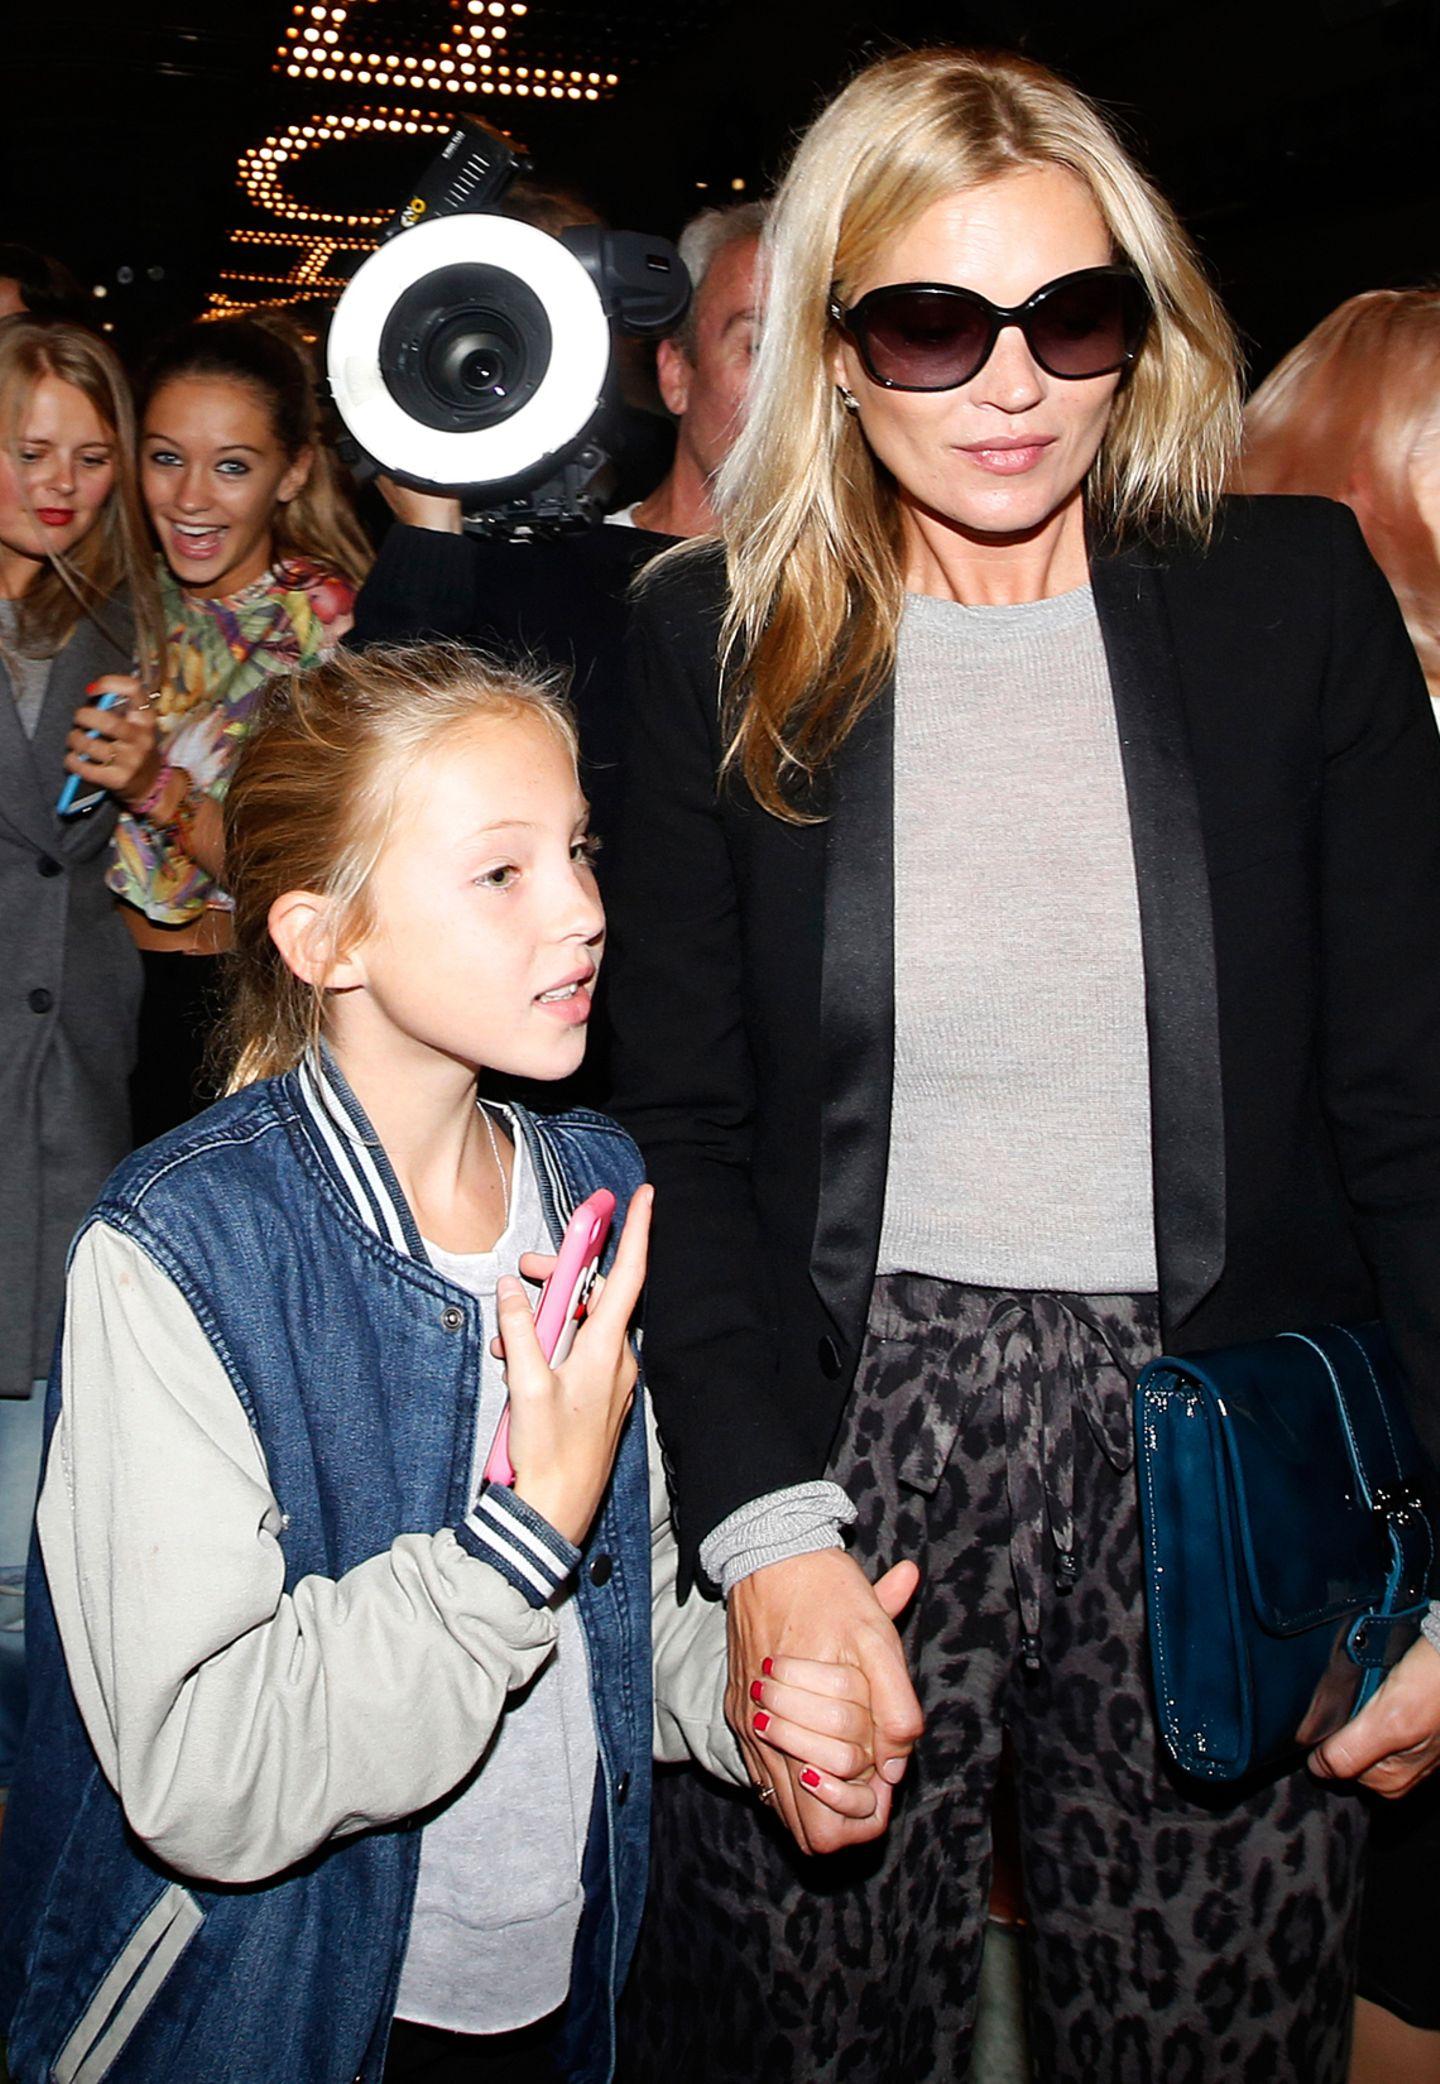 Mutter-Tochter-Tag: Kate Moss besucht mit ihrer Tochter Lila Grace die Unique-Show im Topshop Show Space